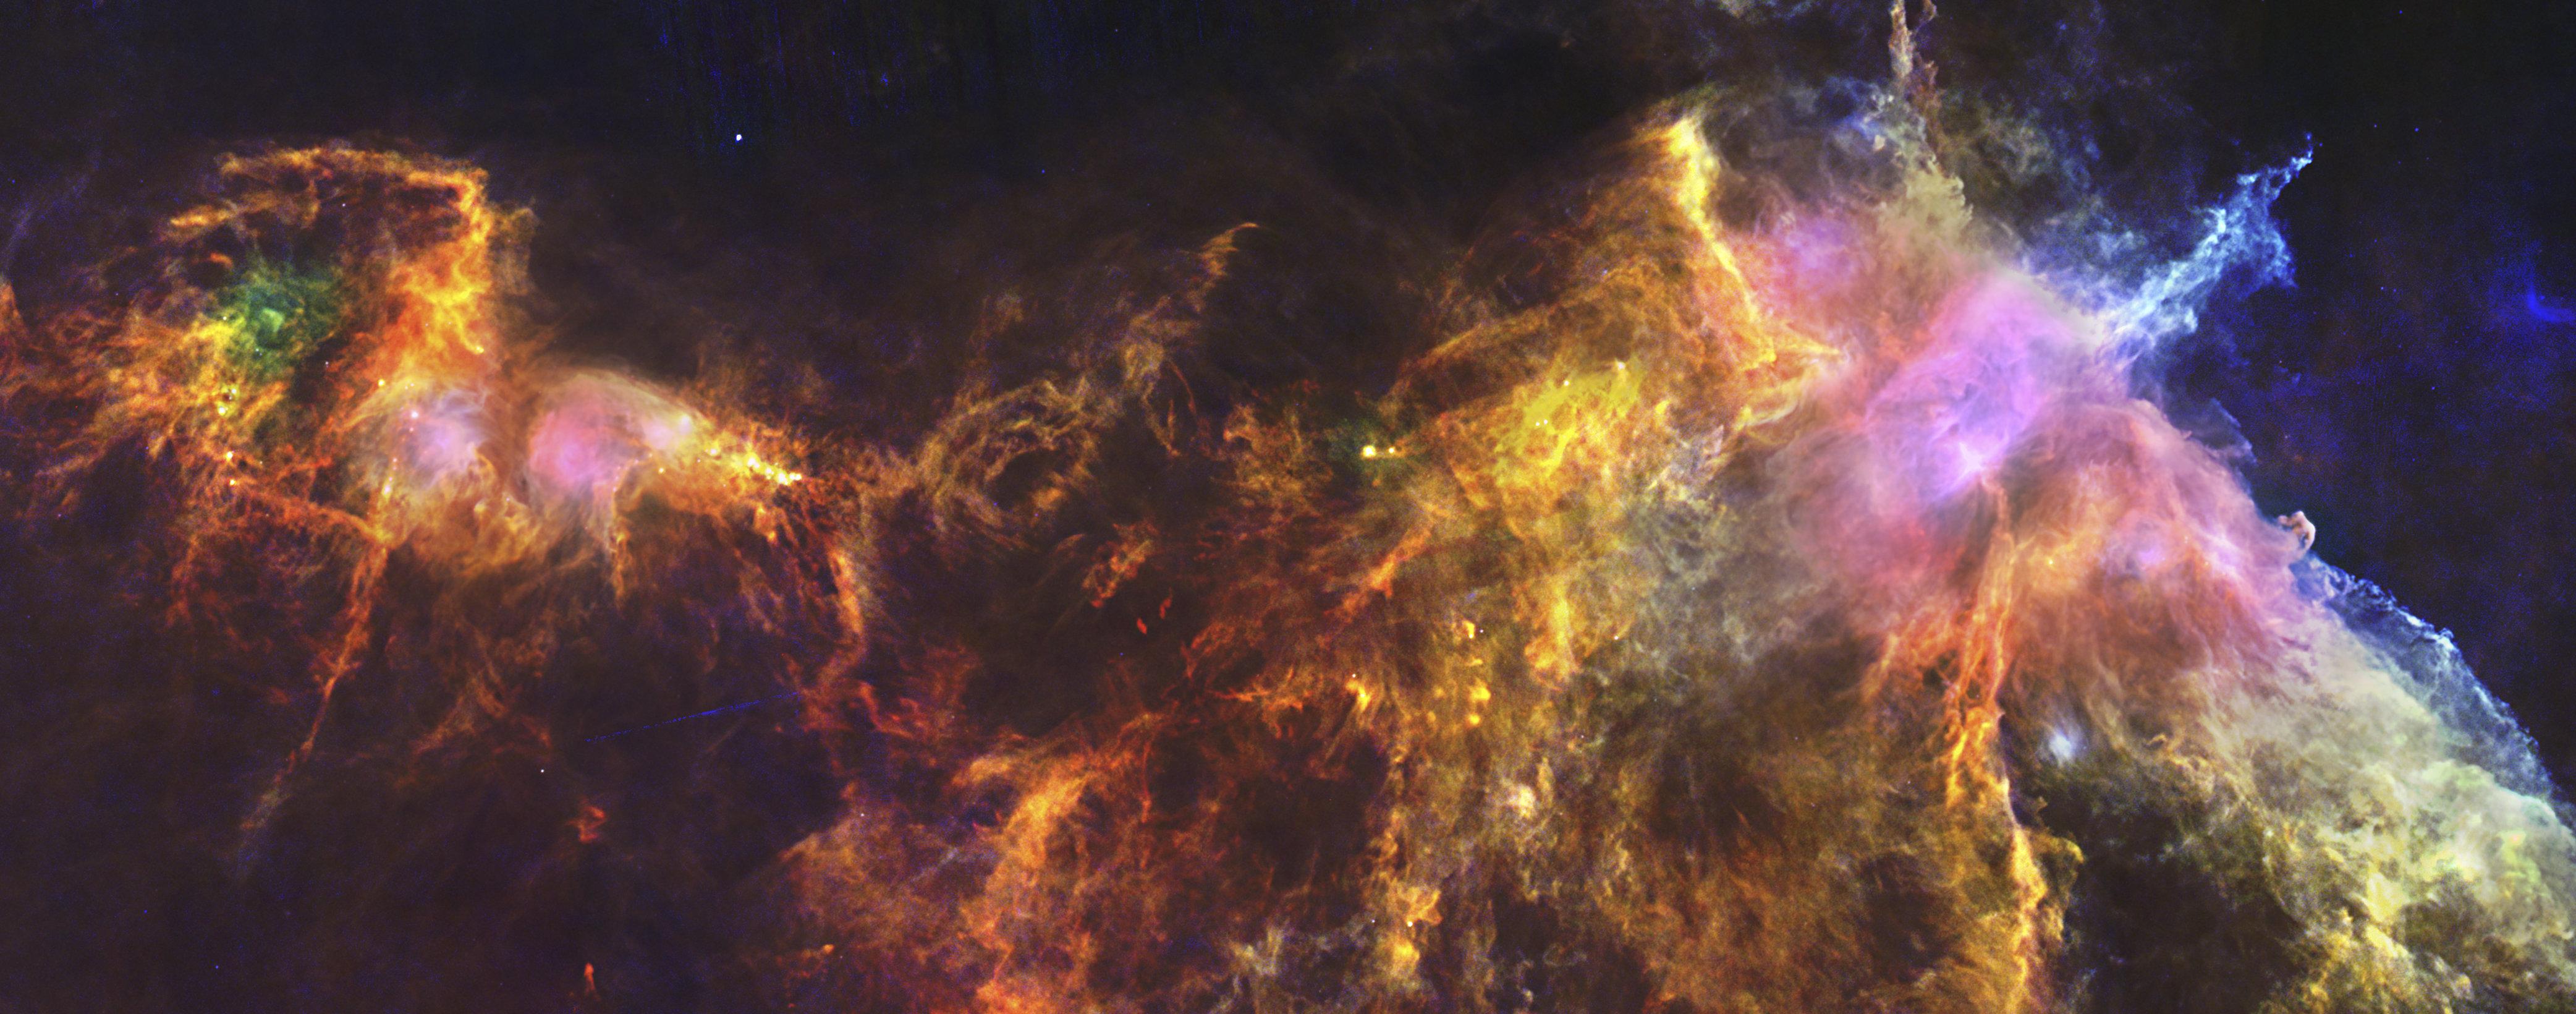 horsehead nebula jesus - photo #21